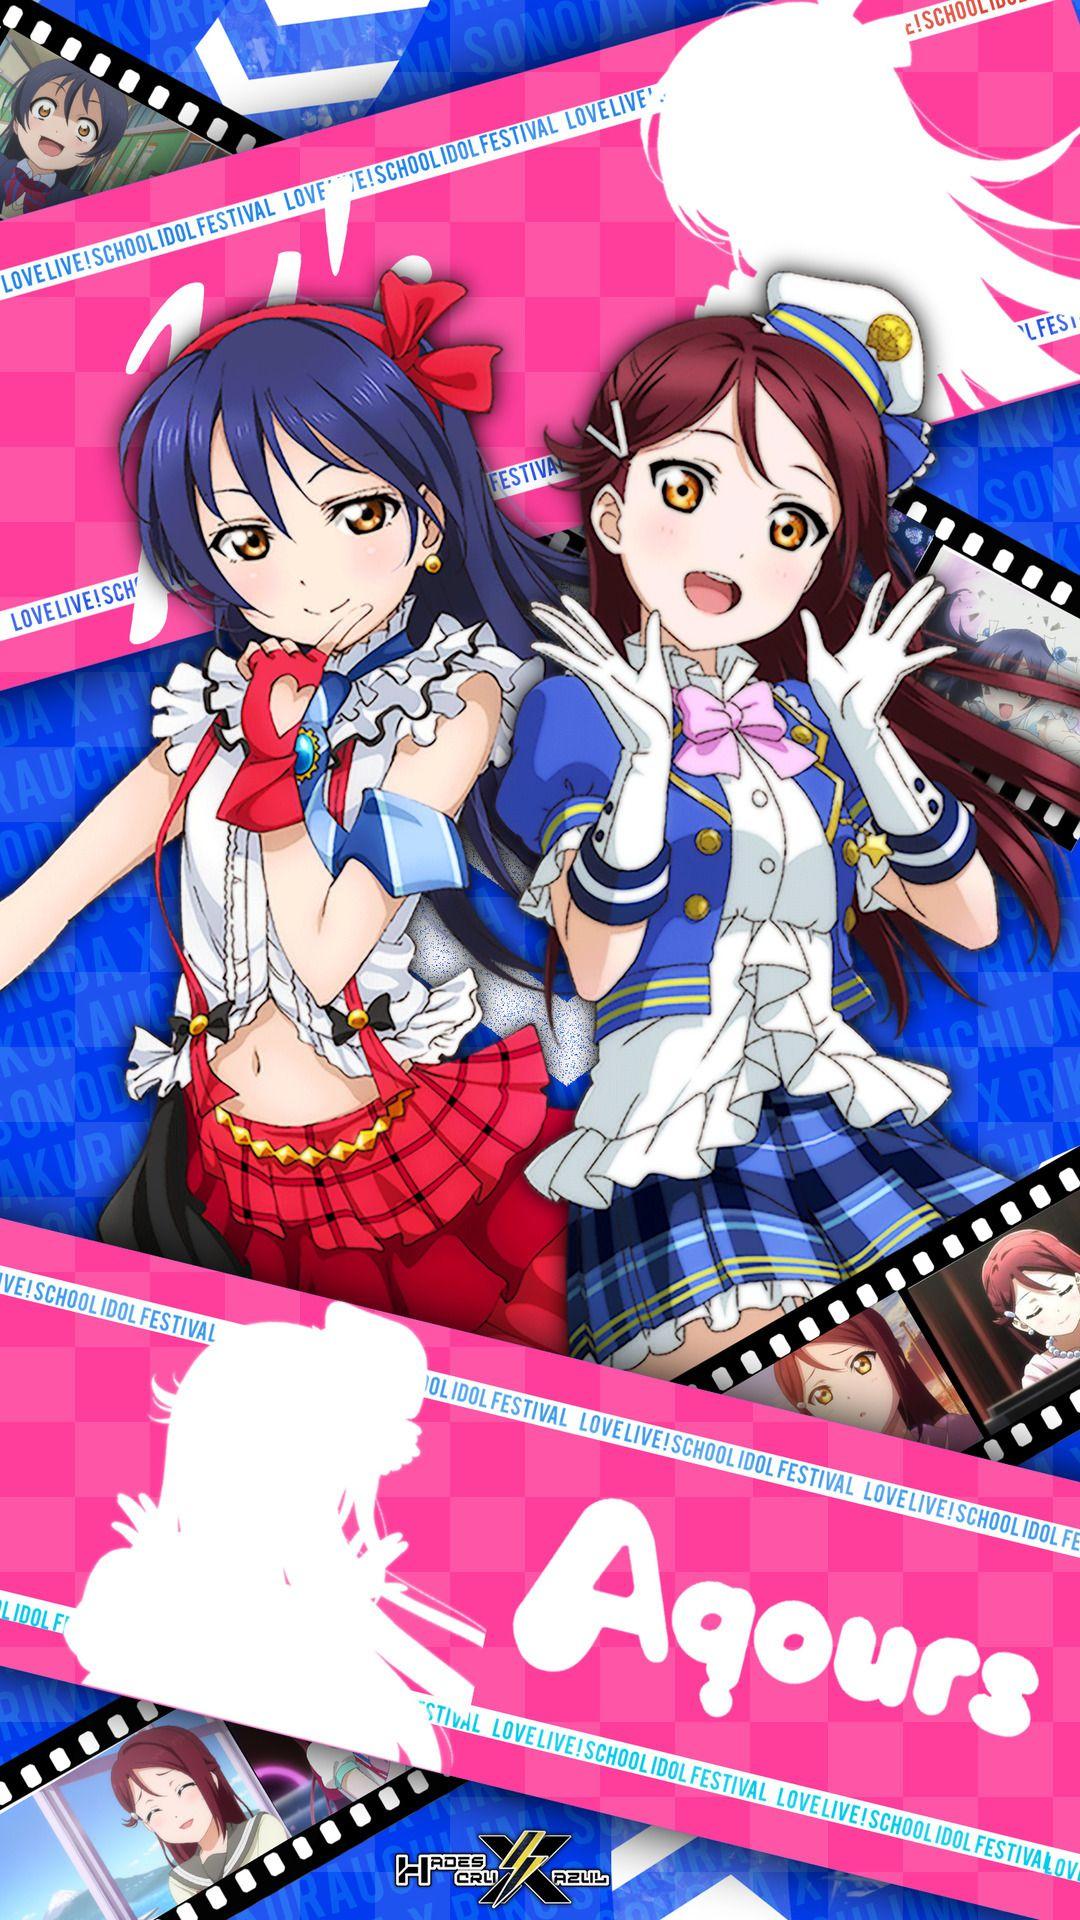 Pin by Nicolas on Love Live µ's & Aqours Anime wallpaper